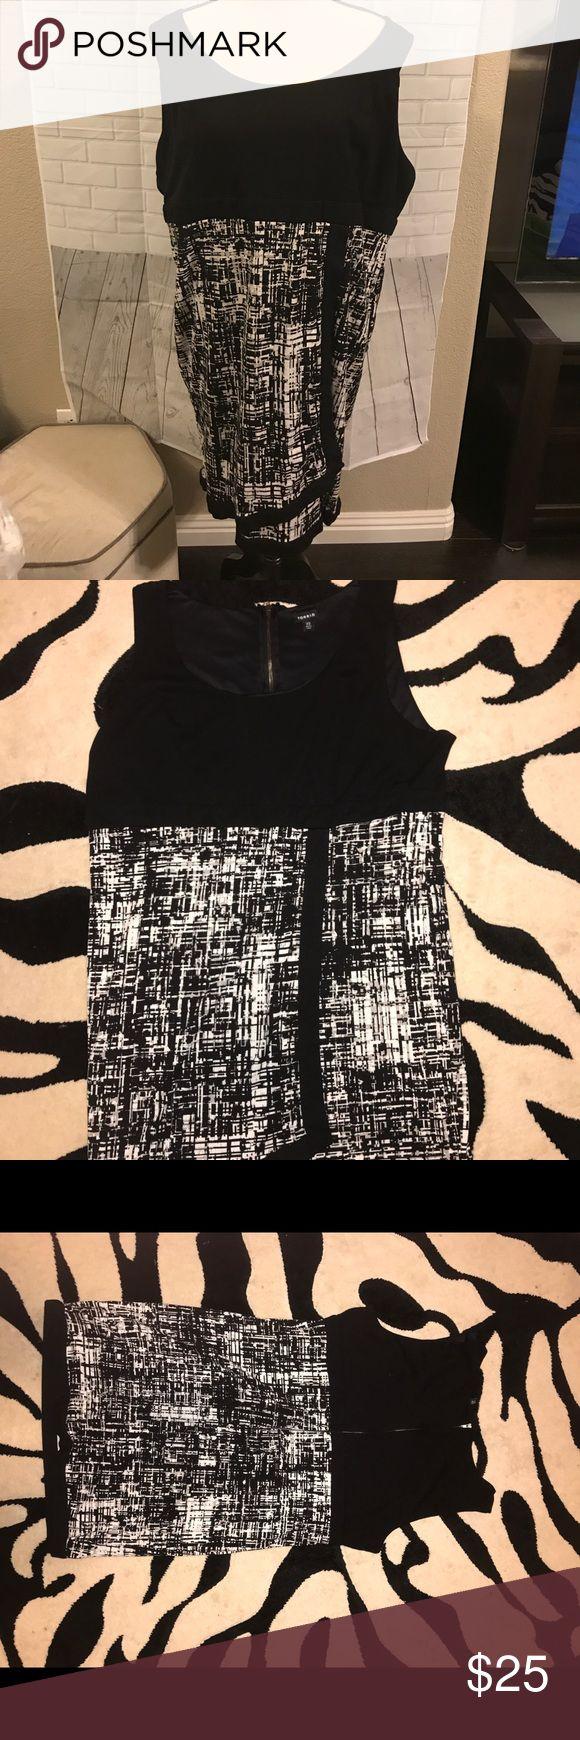 Torrid size 22 dress Preowned no damage size 22 torrid Dresses Midi